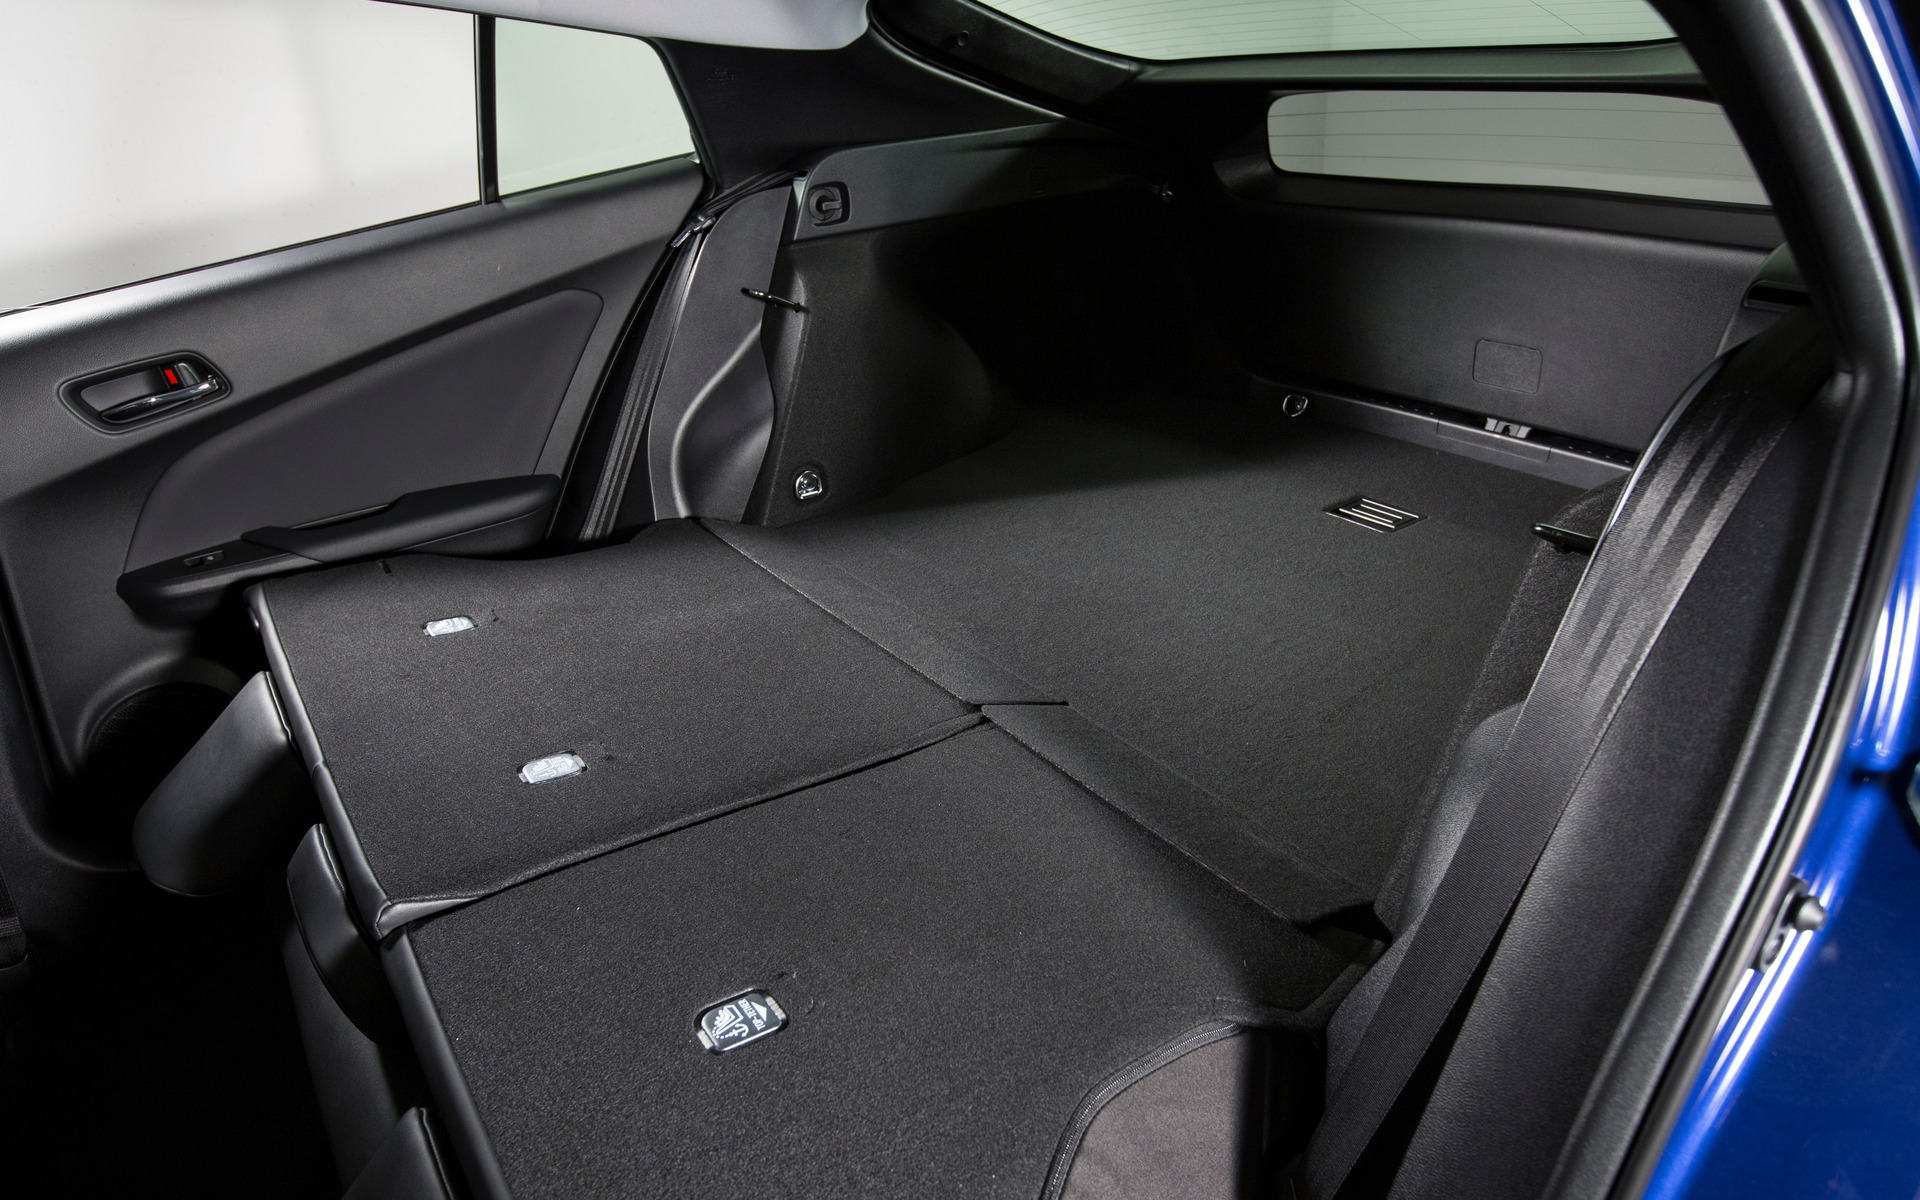 Toyota Prius 2016 - Un habitacle spacieux et modulable.